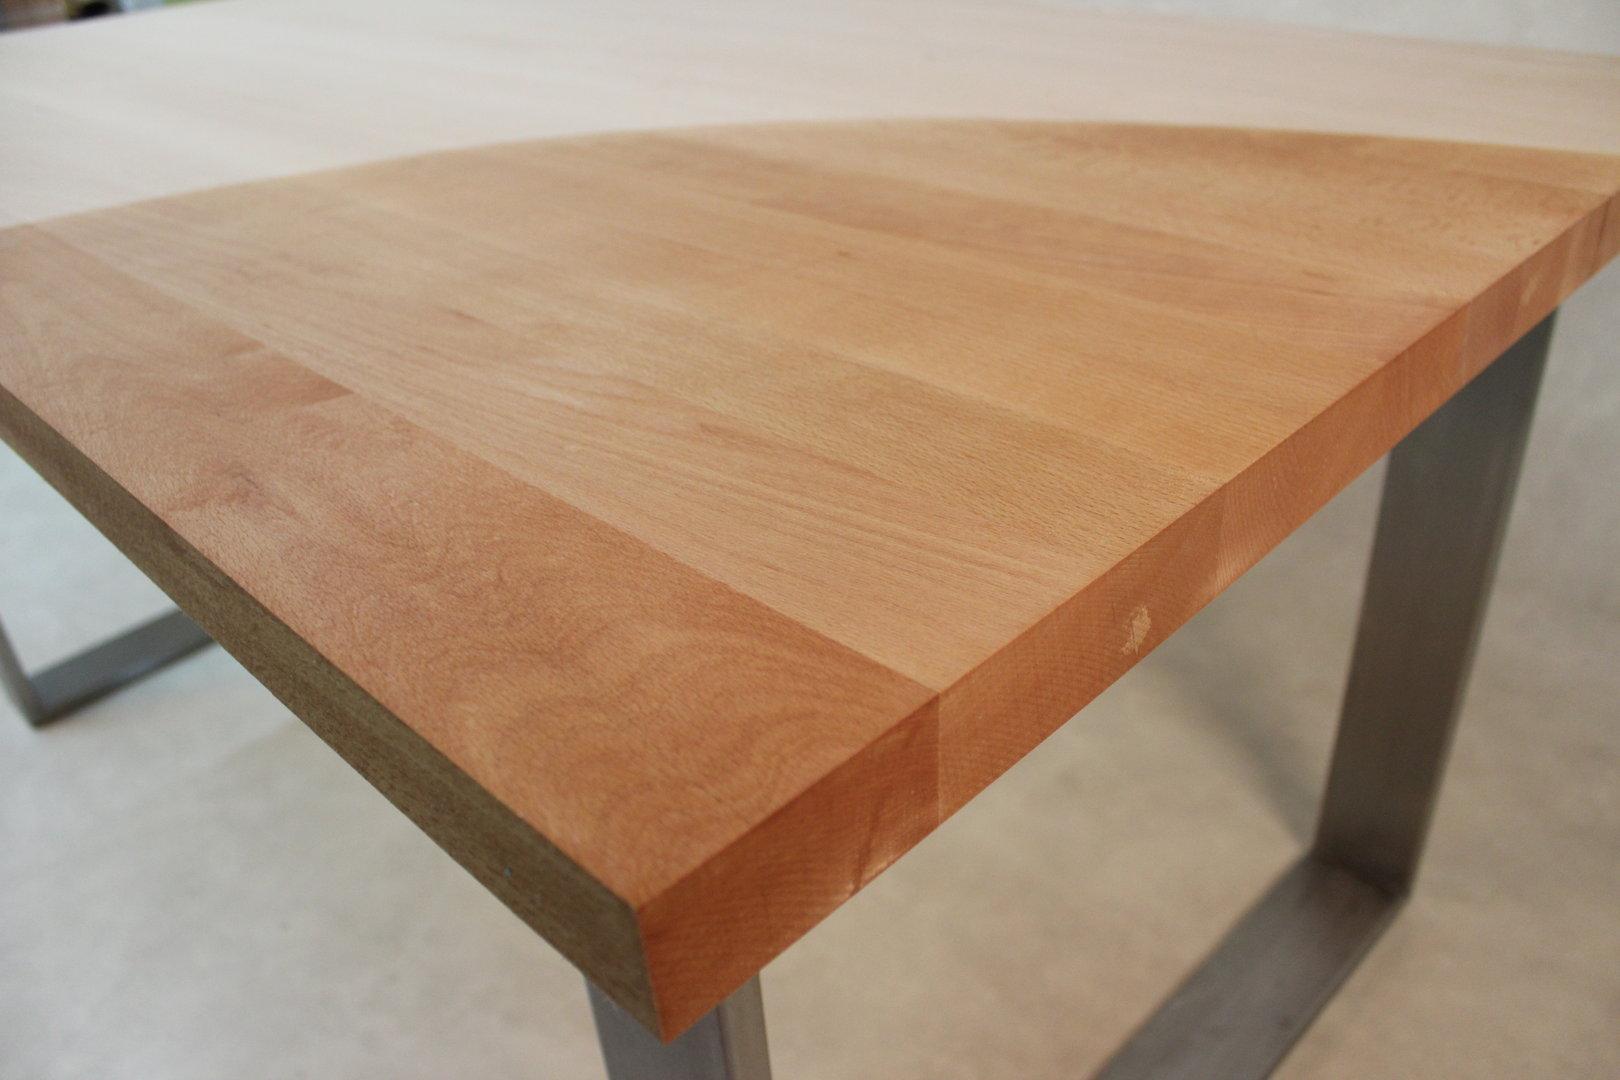 Tischplatte massivholz  Tischplatte Aus Massivholz